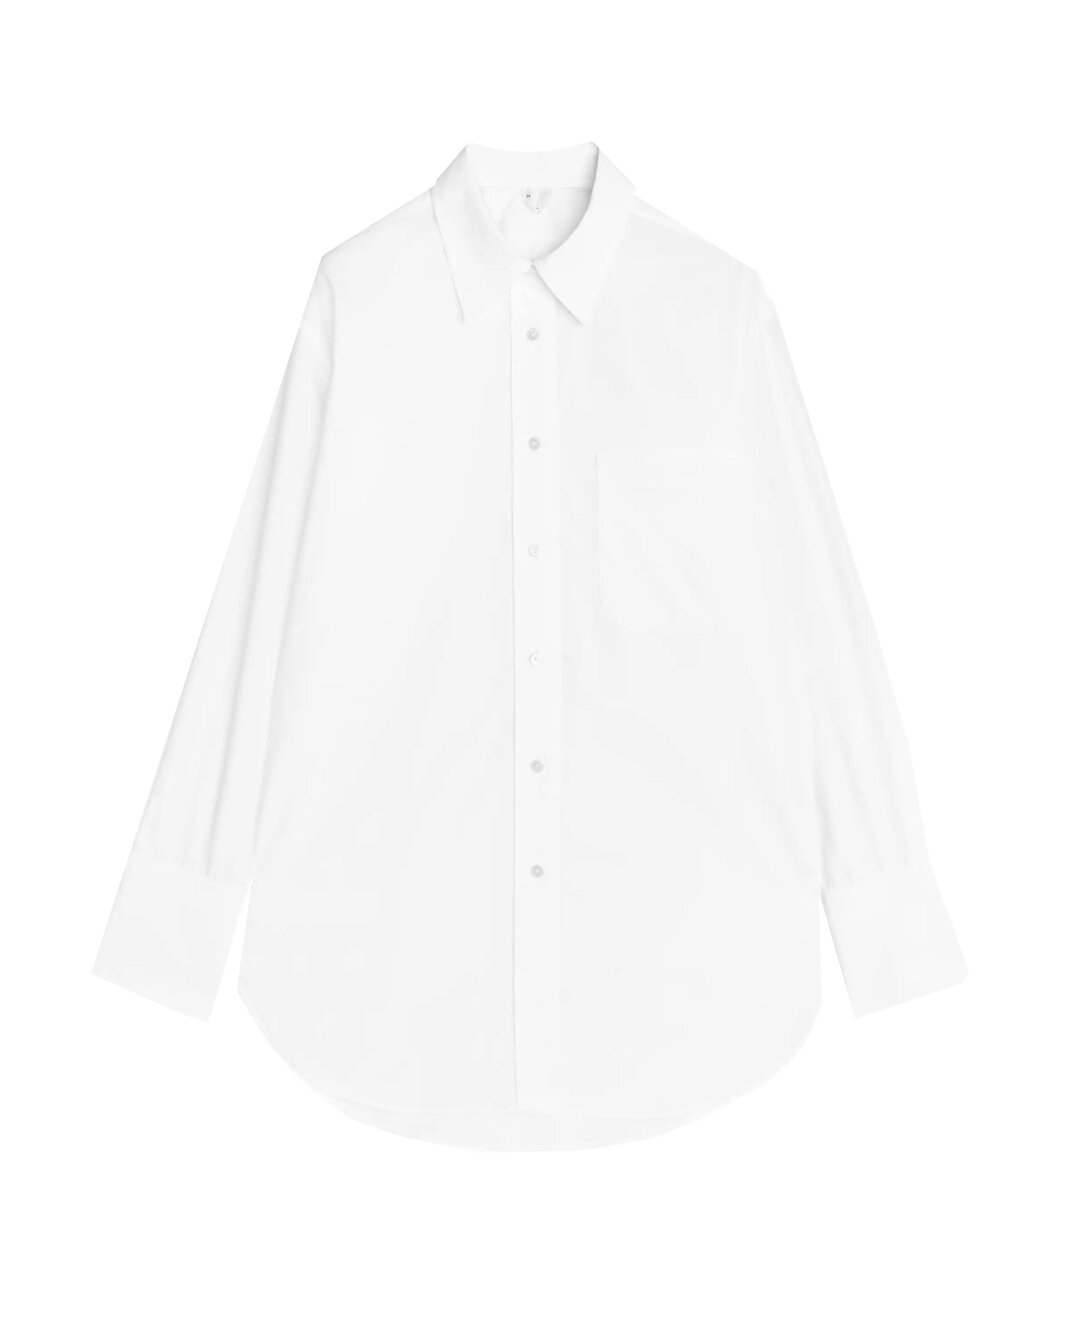 arket organic shirt.jpg